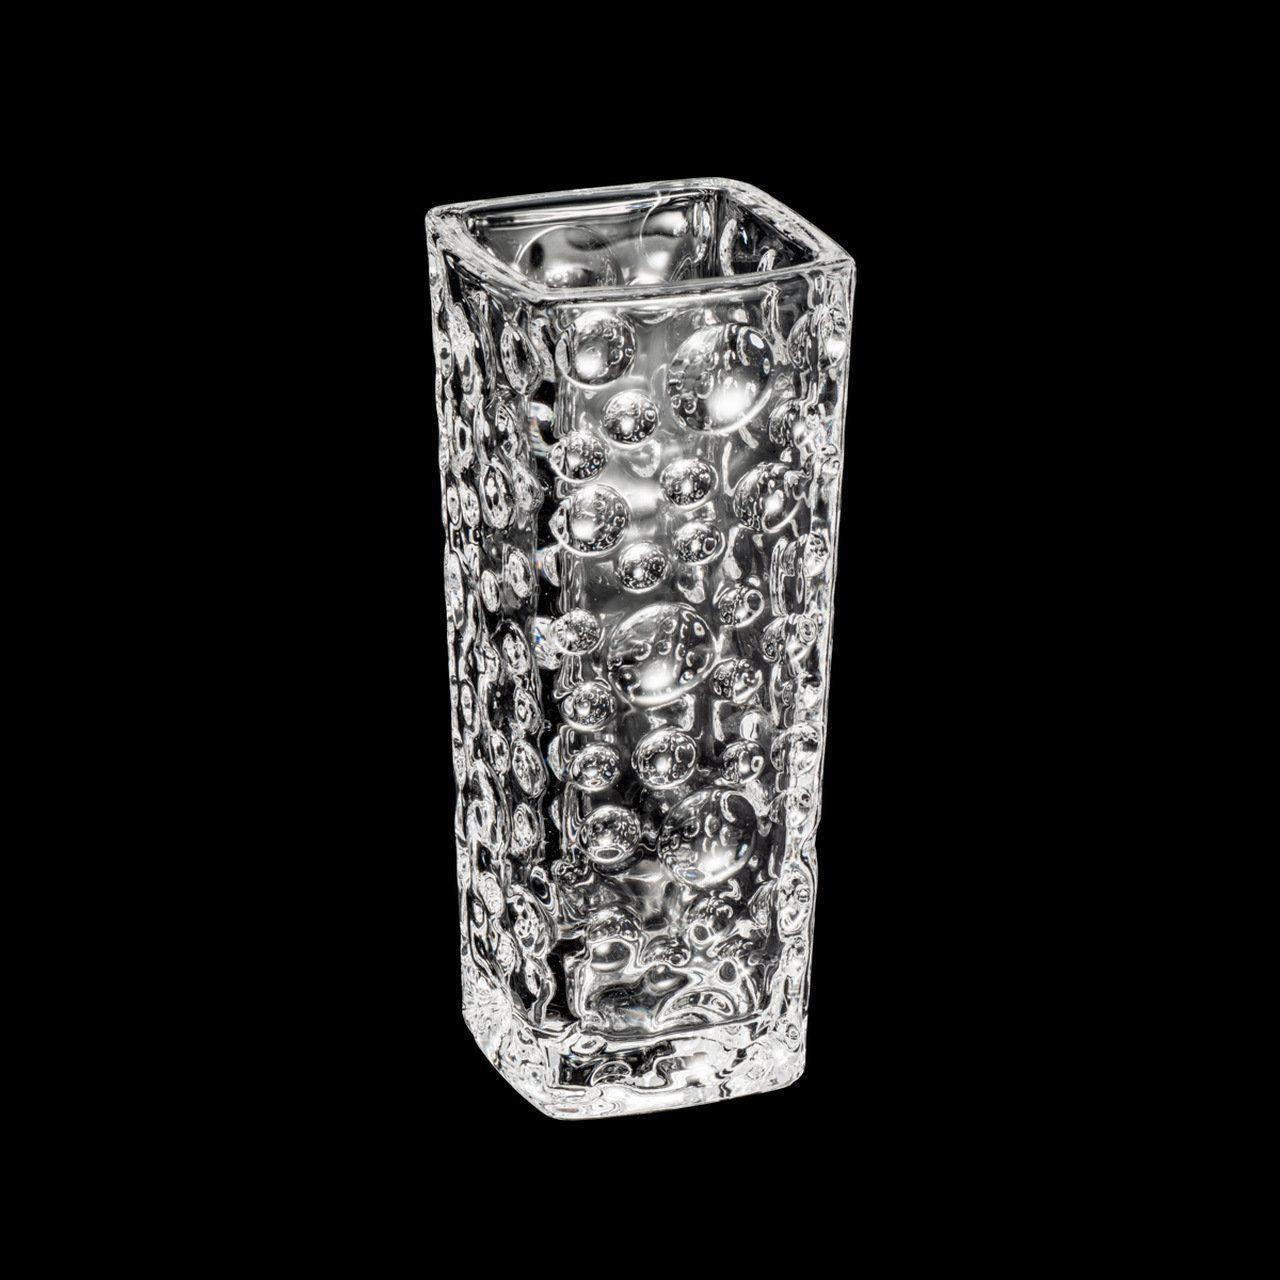 Vaso decorativo solitário 15,6 cm de cristal transparente Bubble Bud Wolff - 2931